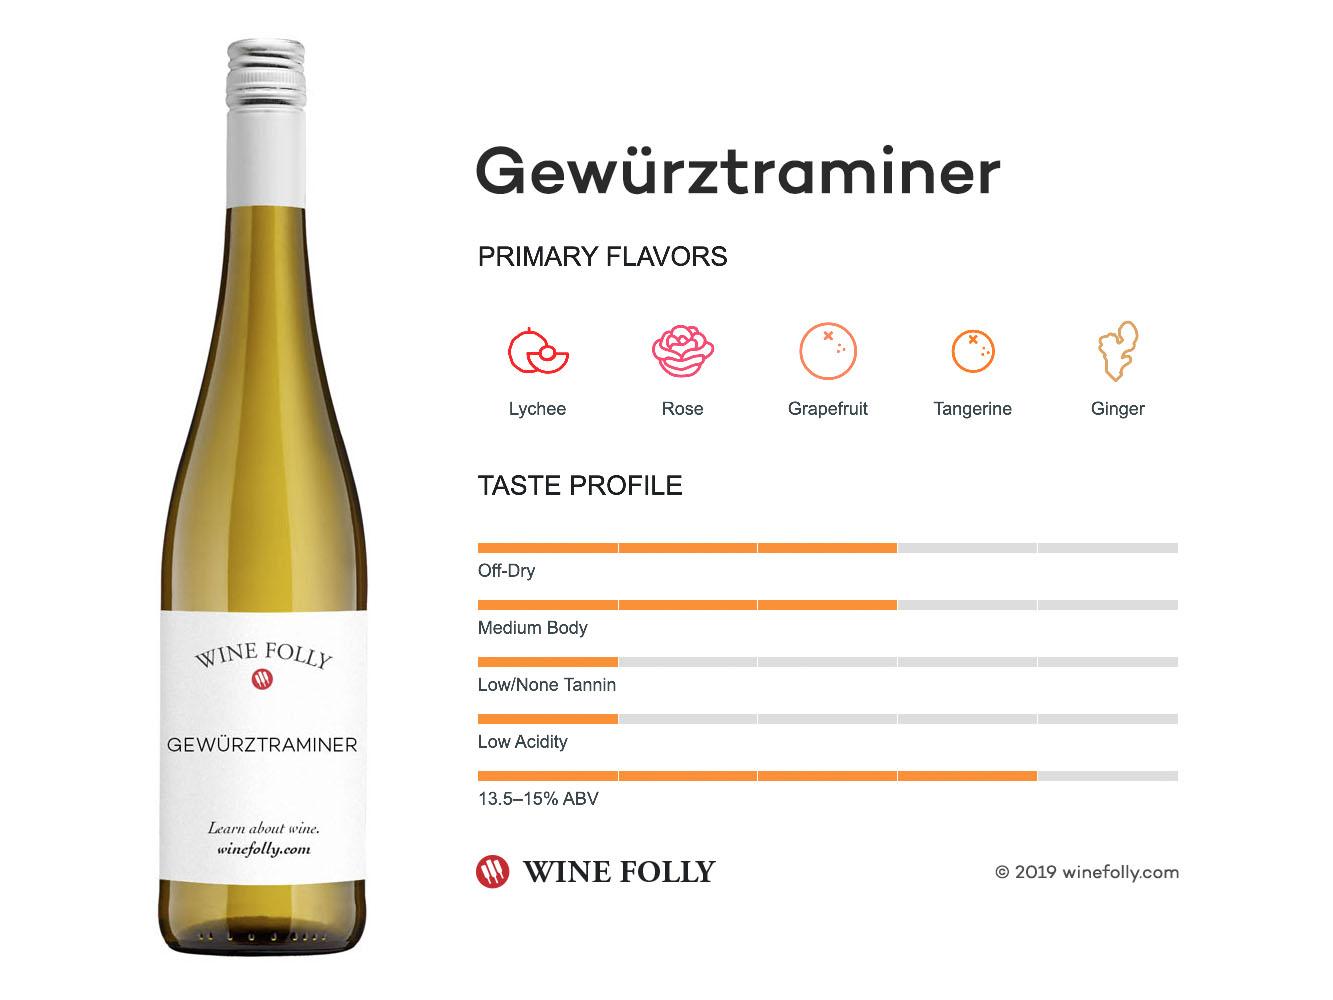 gewurztraminer-wine-tasting-winefolly.jpg